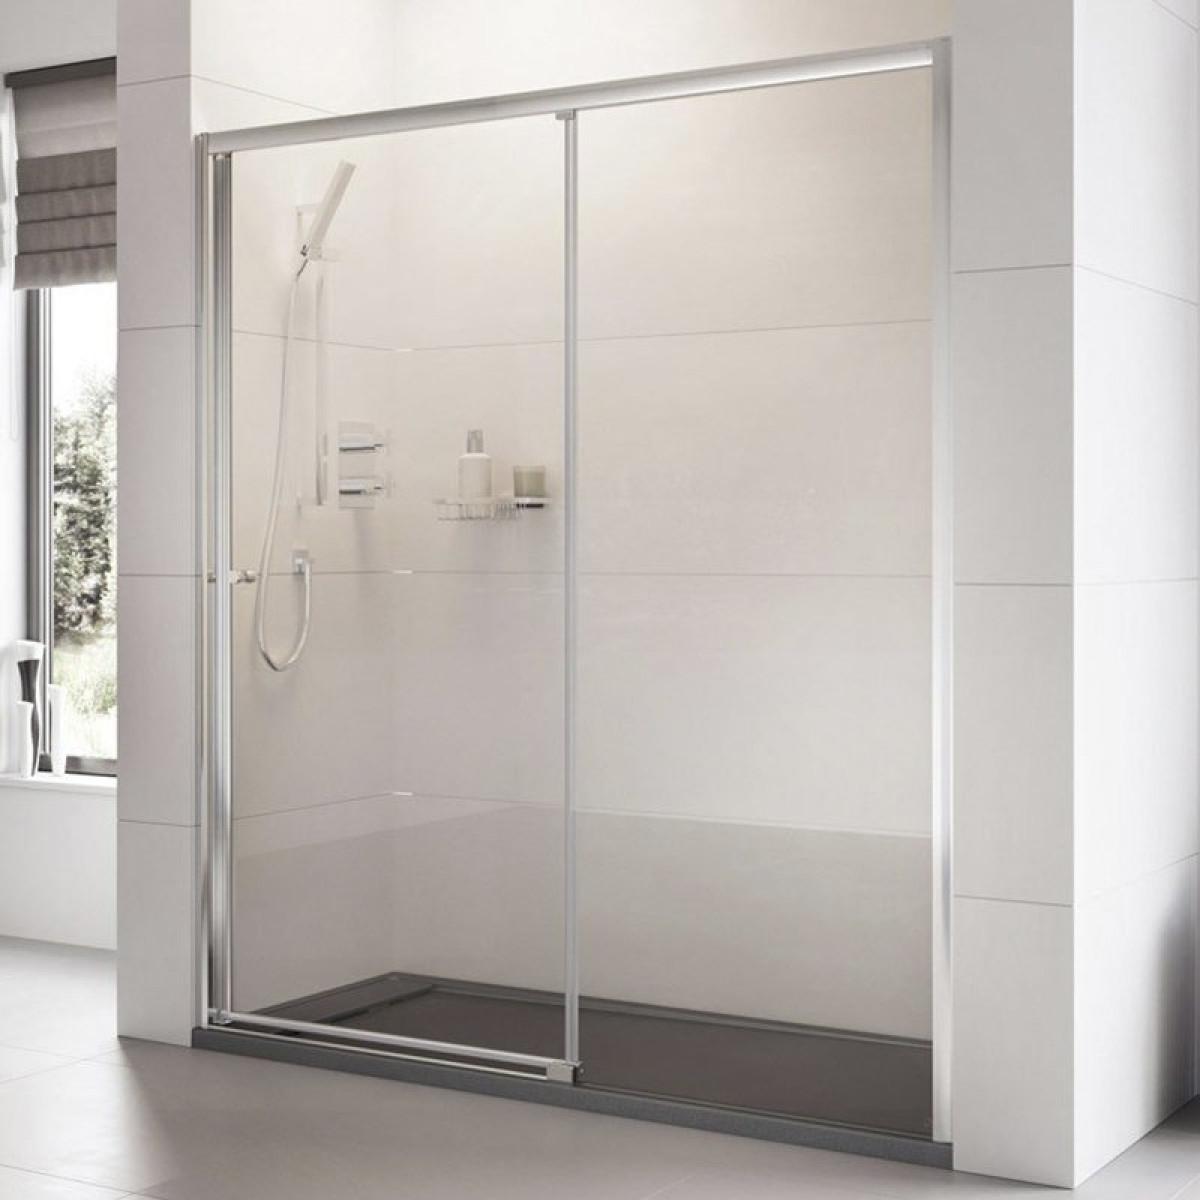 Roman Haven 1200mm Level Access Left Hand Sliding Shower